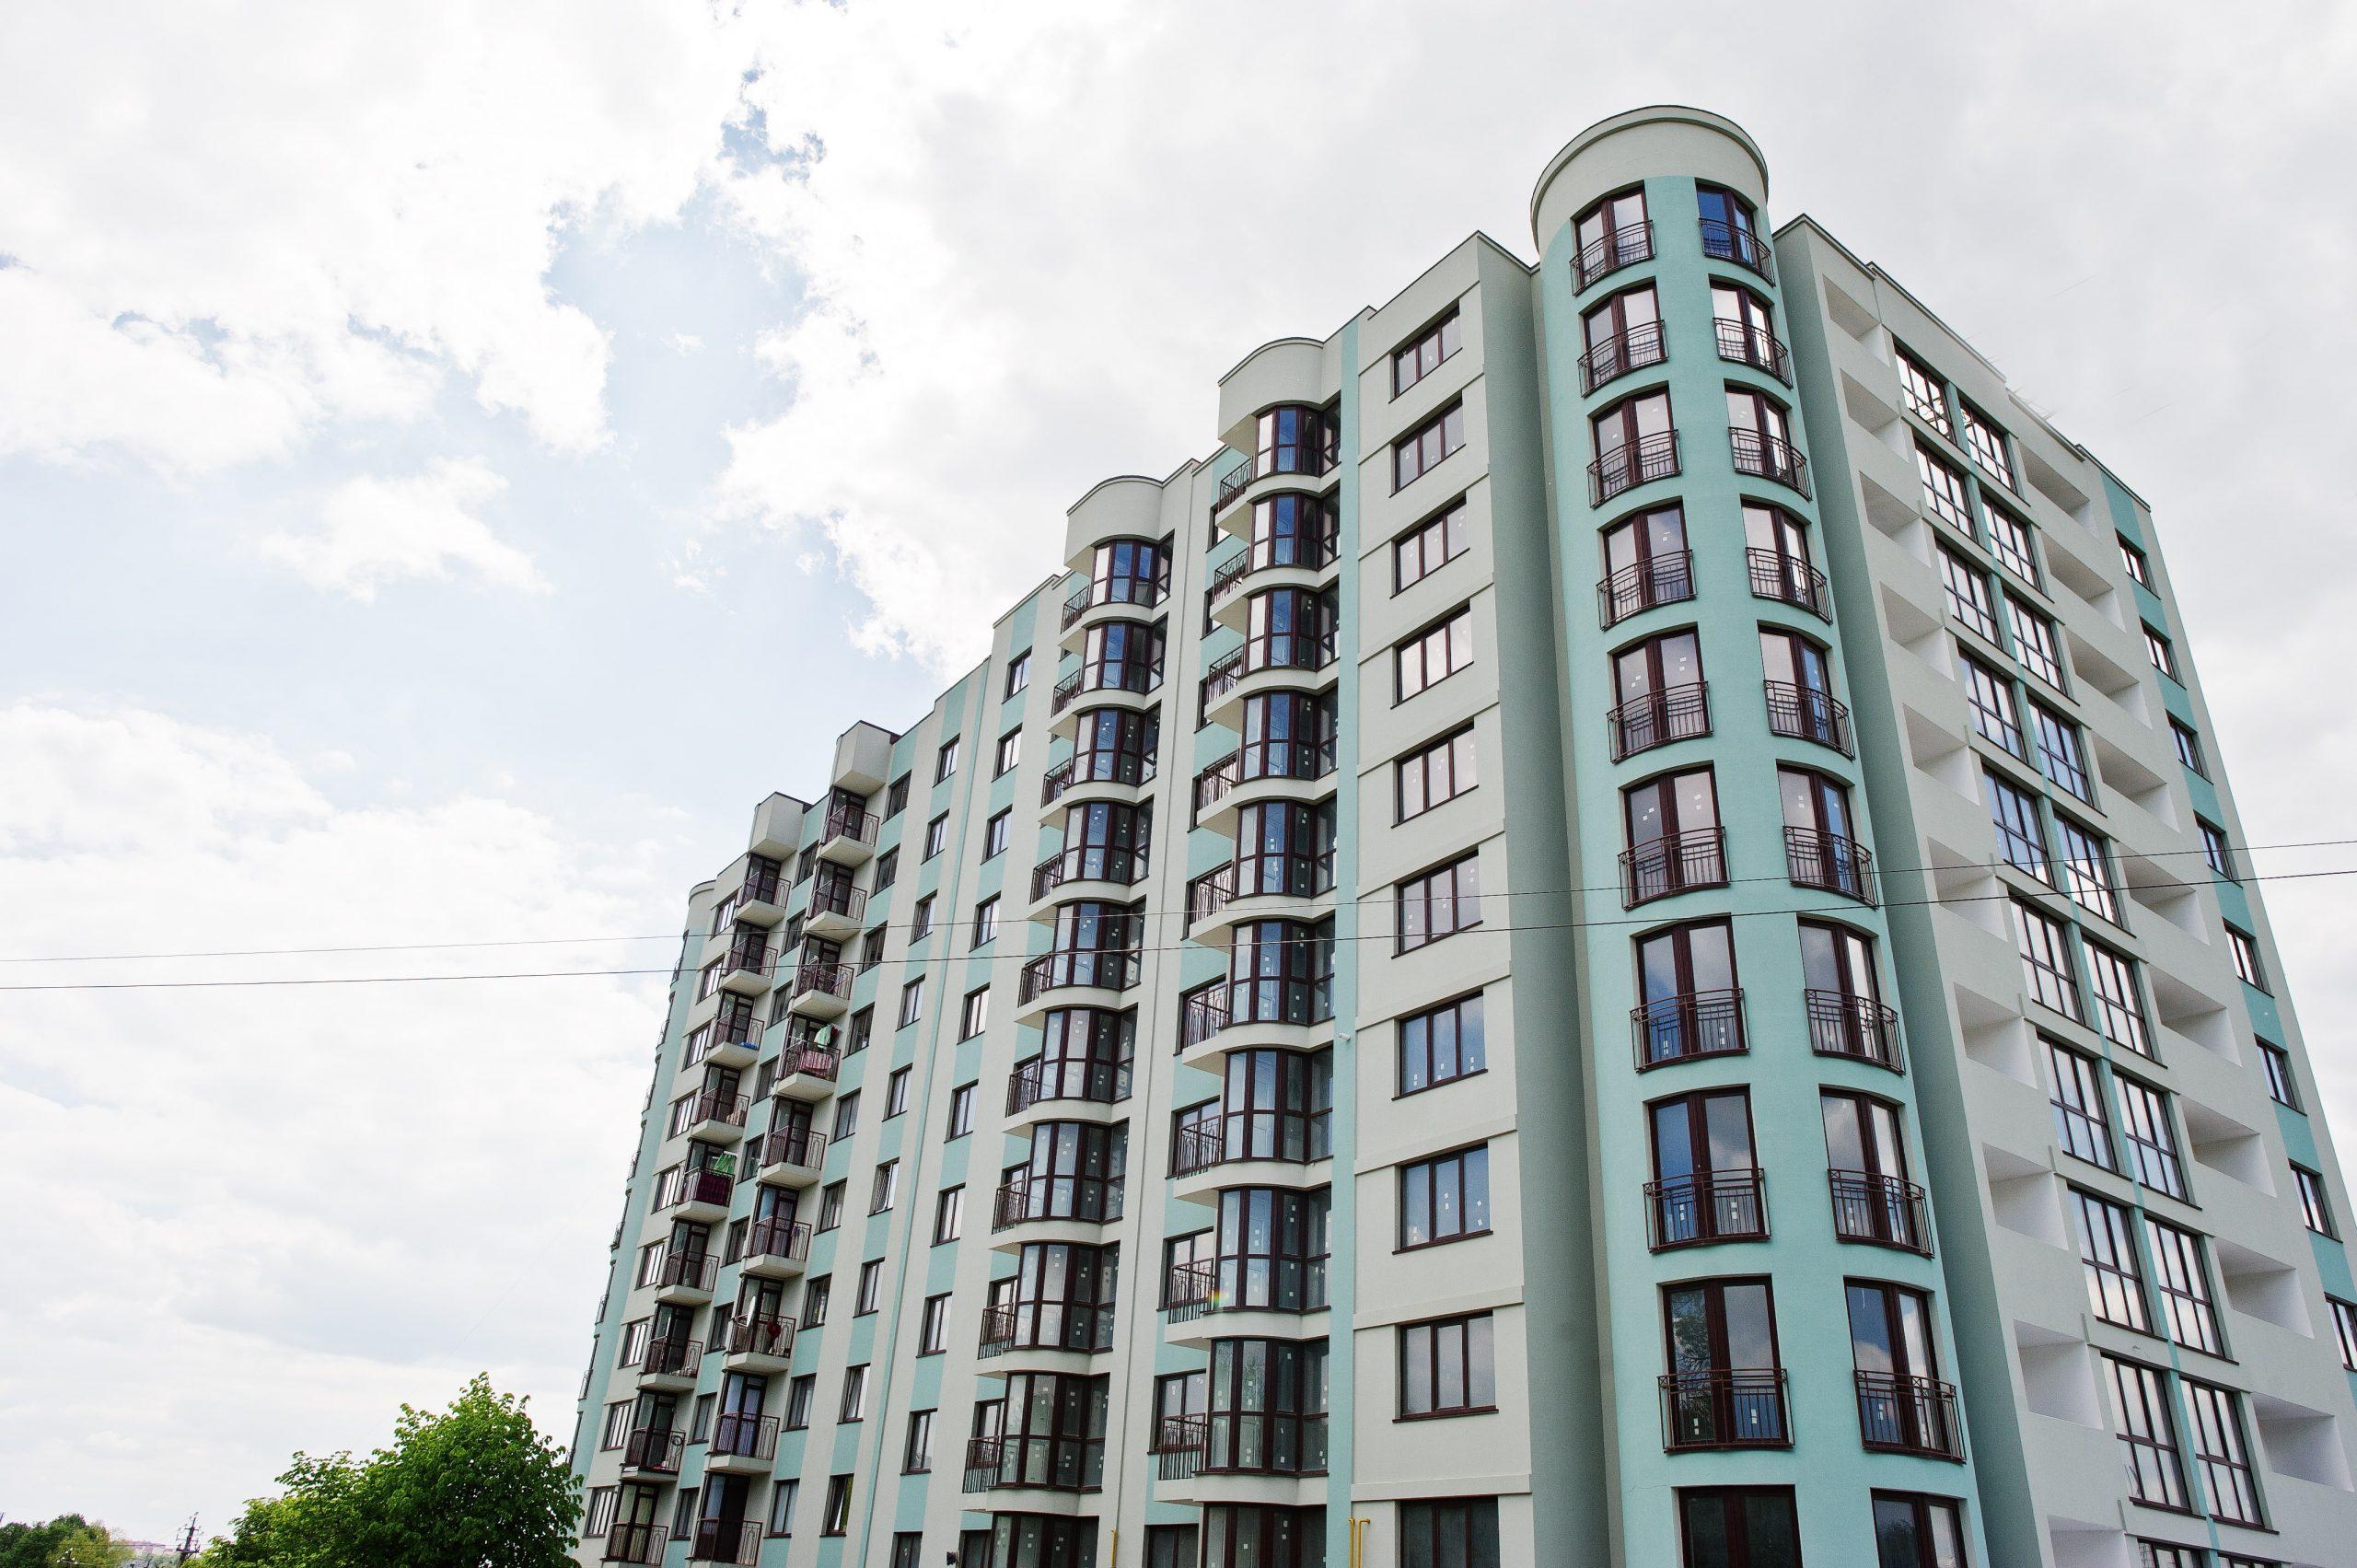 balcony-of-new-modern-turquoise-multi-storey-FQCG3W6